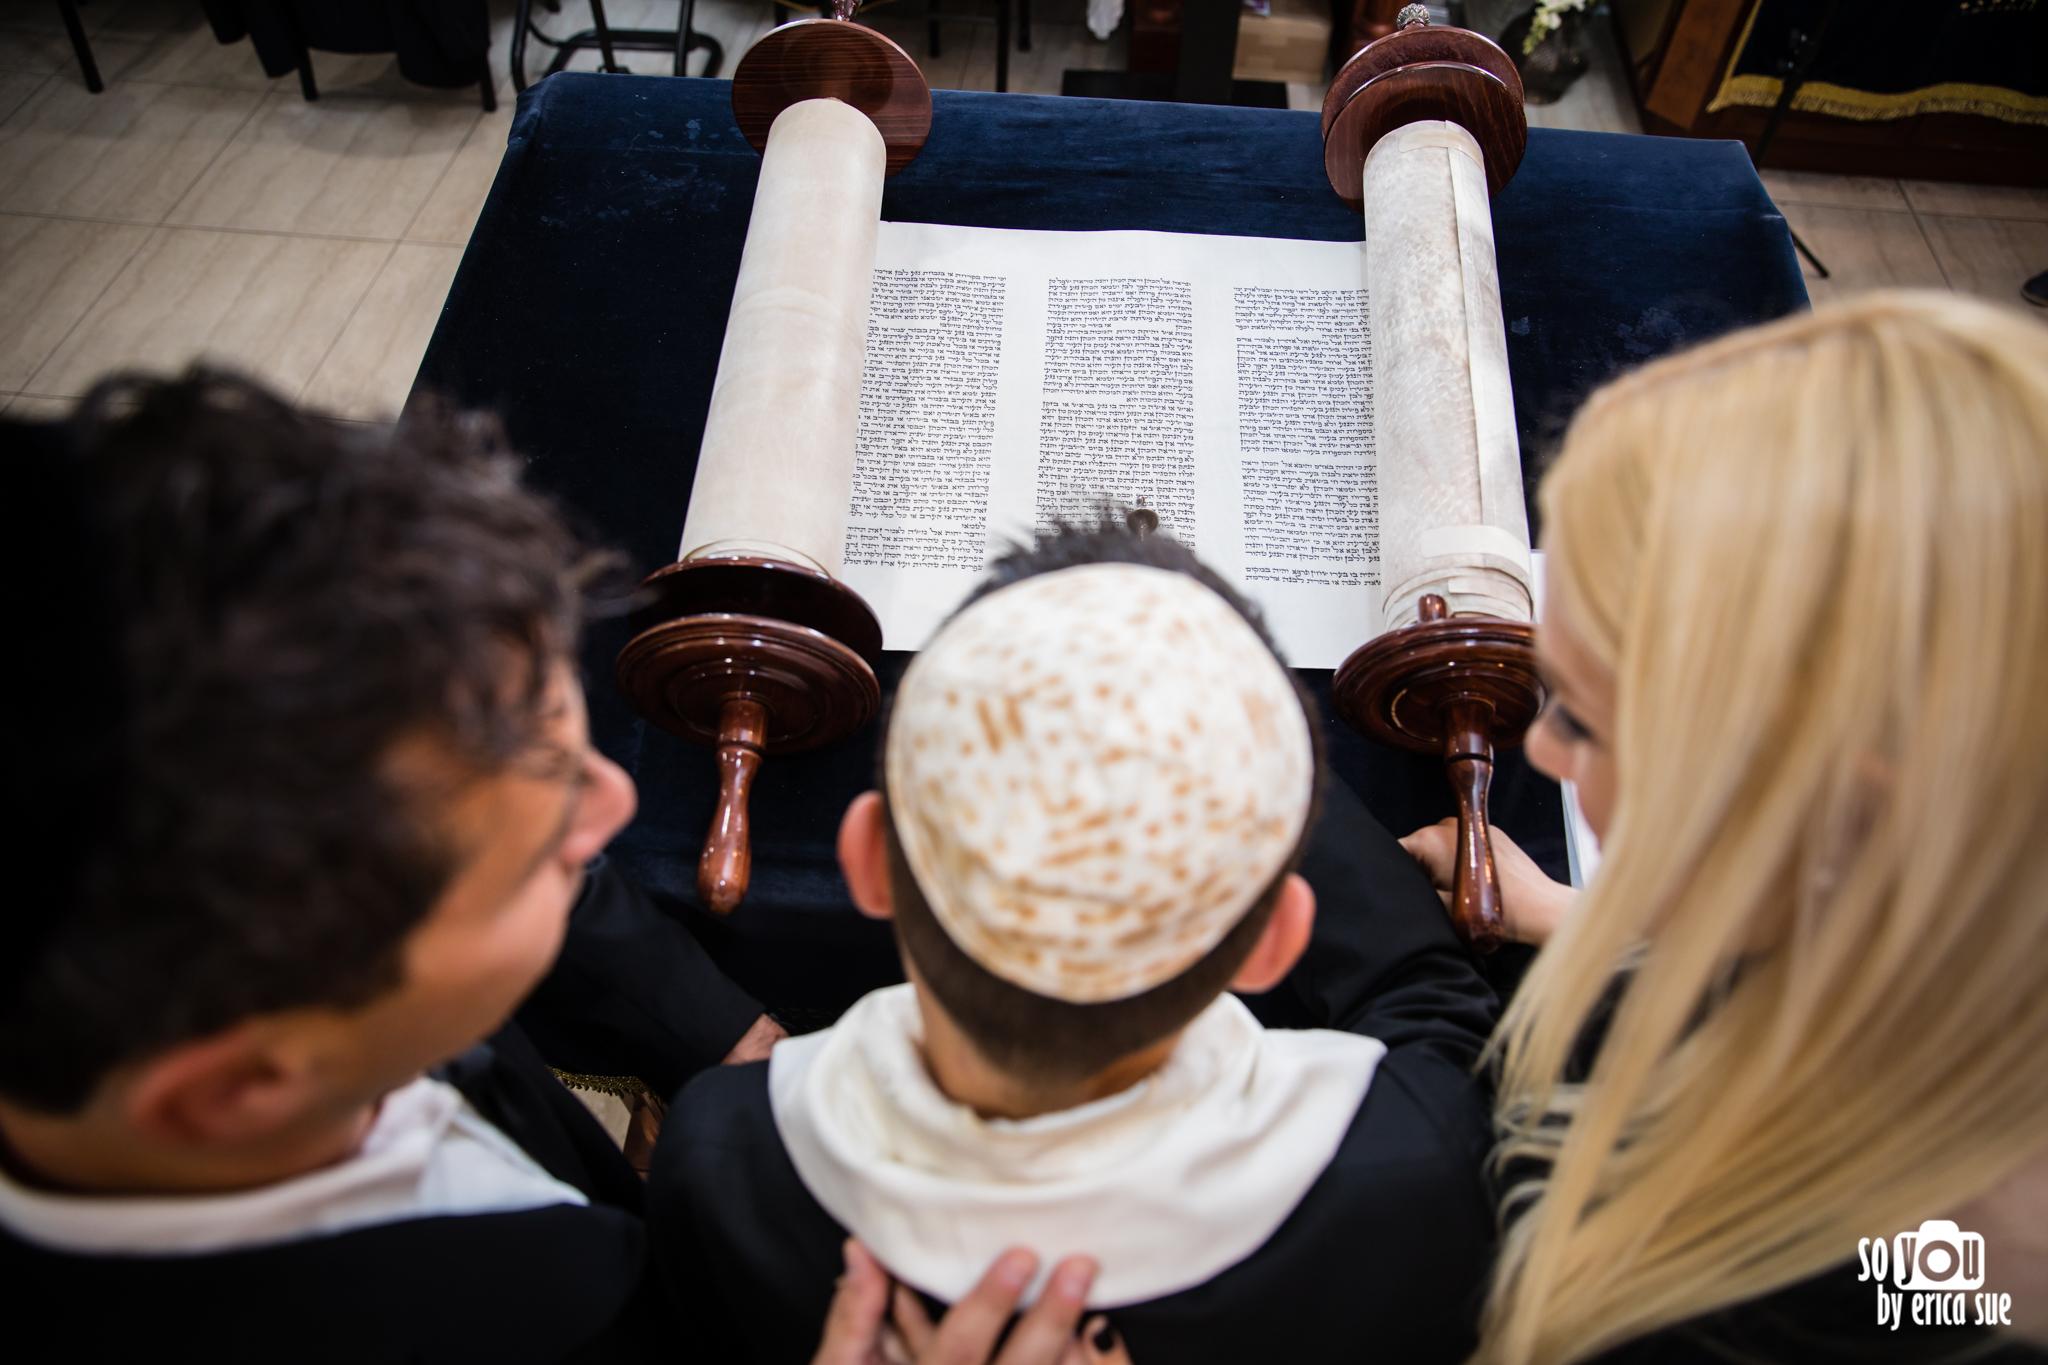 so-you-by-erica-sue-bar-mitzvah-chabad-parkland-davie-fl-photography-0069.jpg